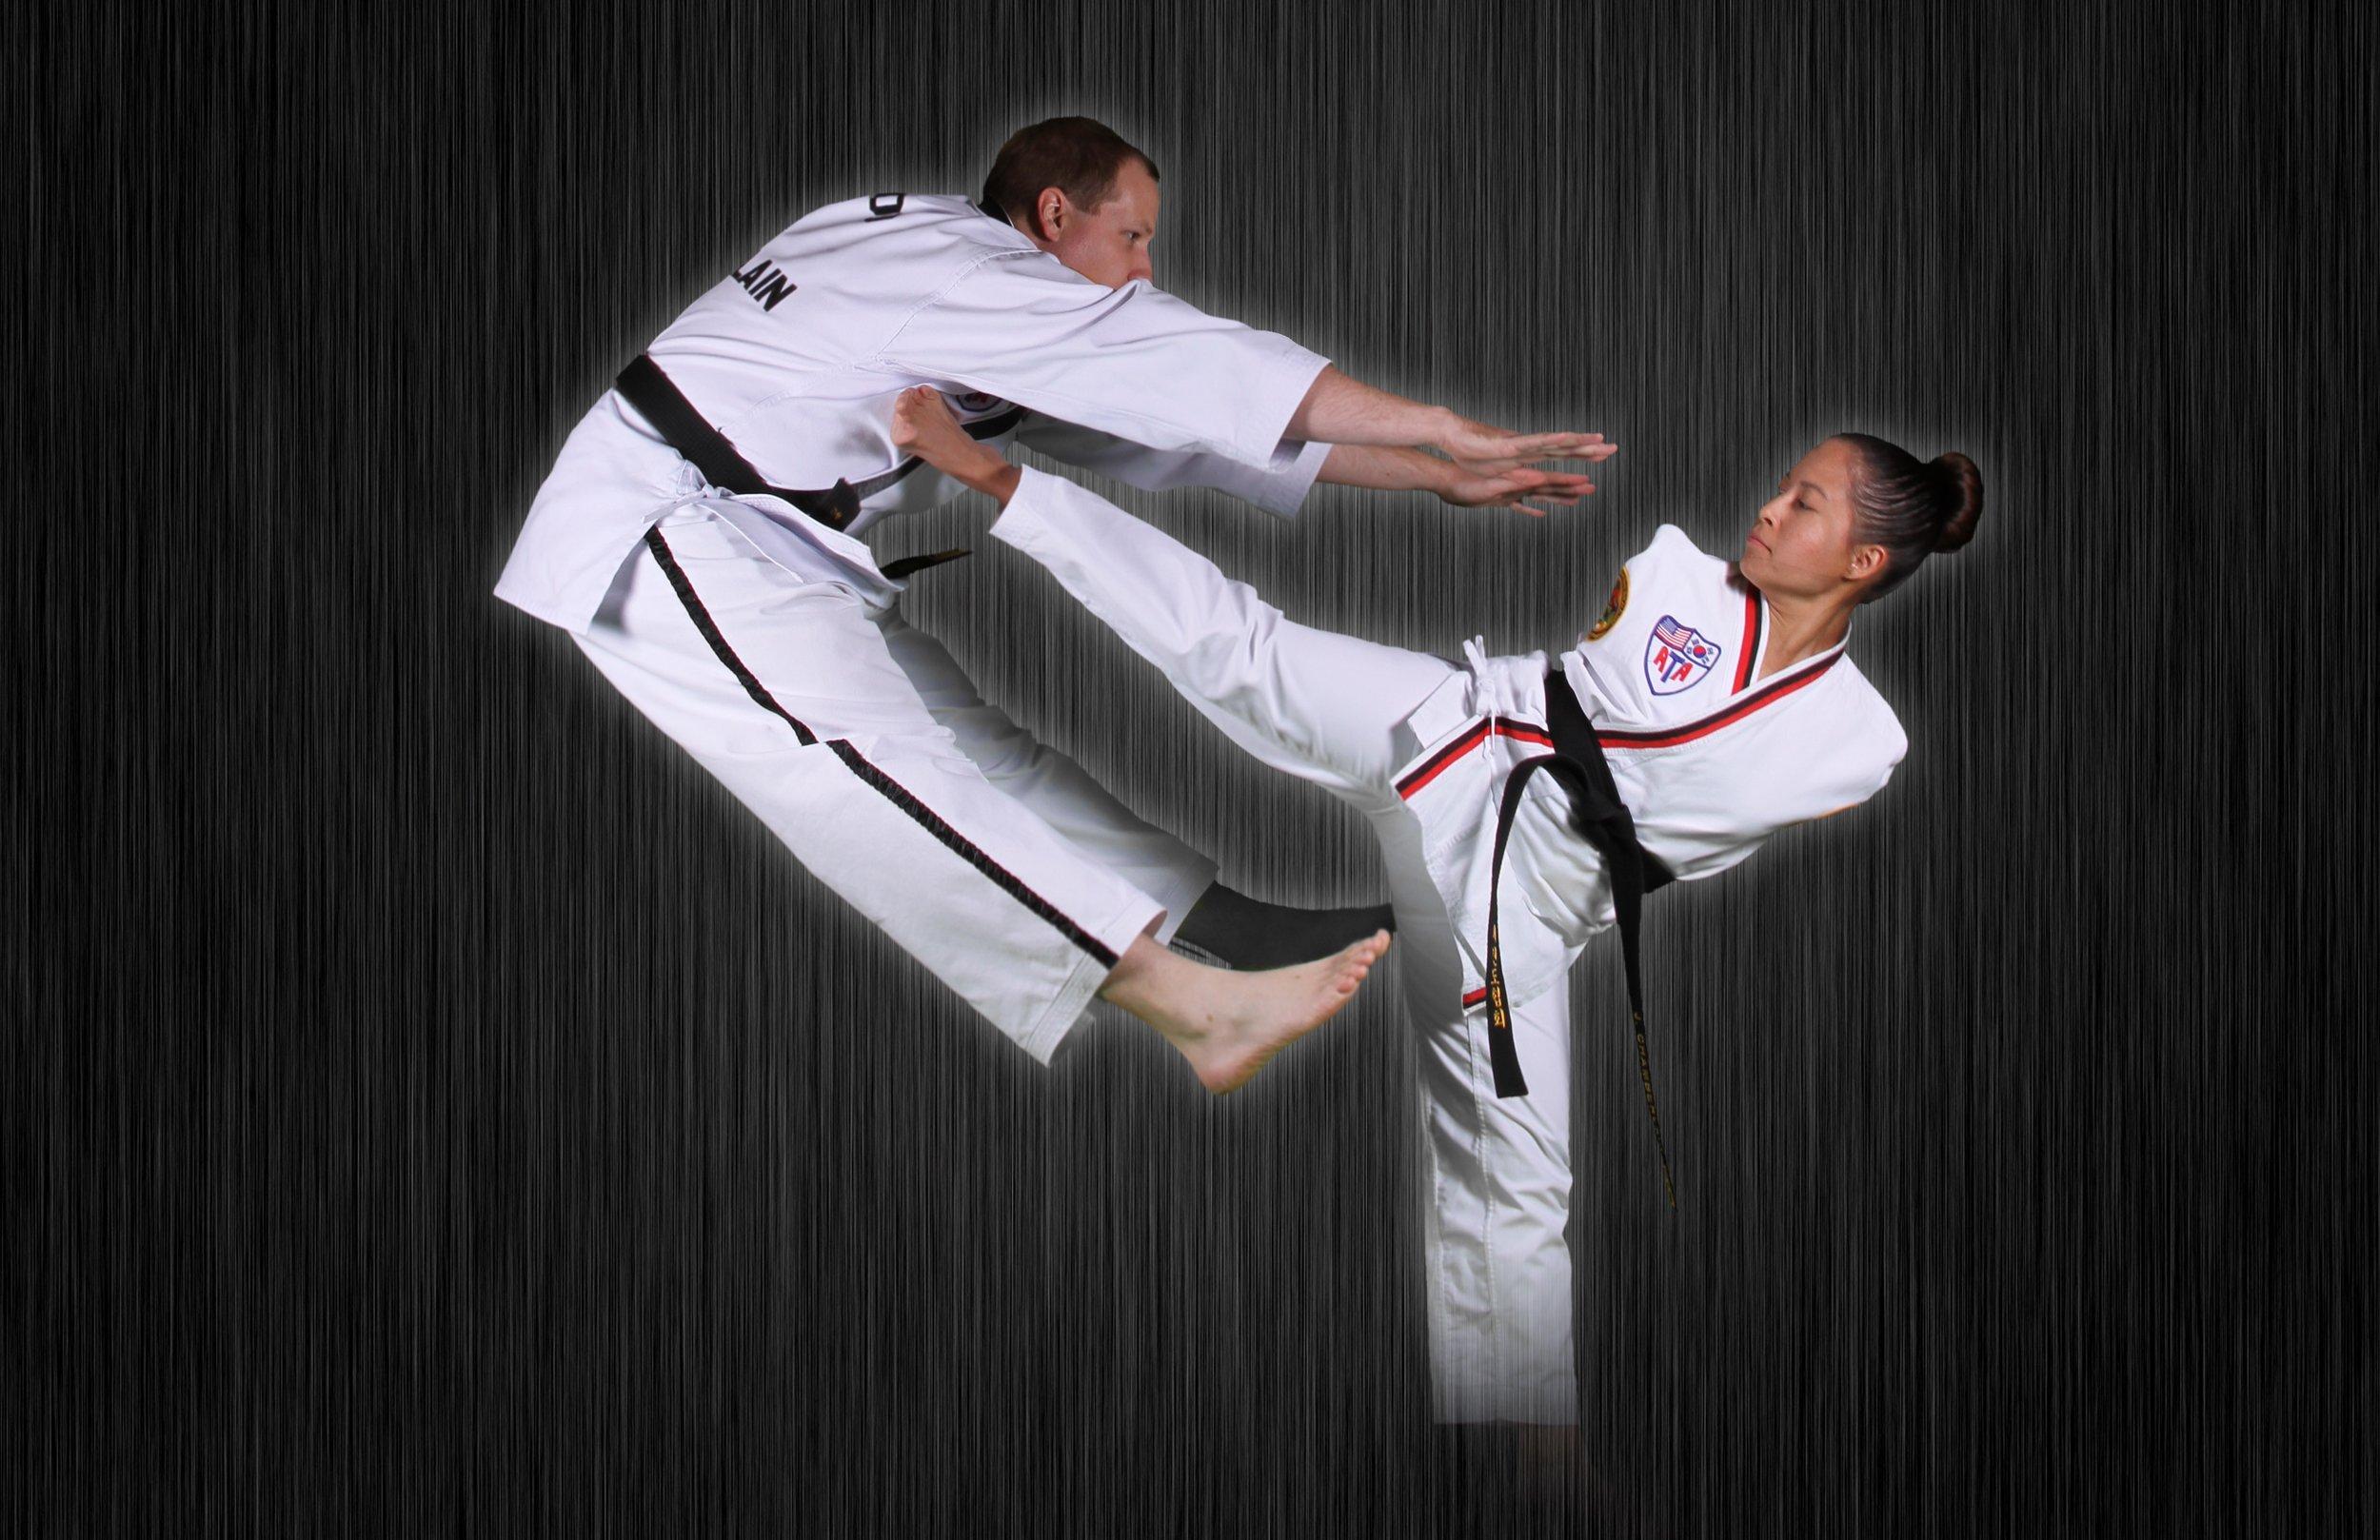 Patrick and Jessica Cox Taekwondo.jpg